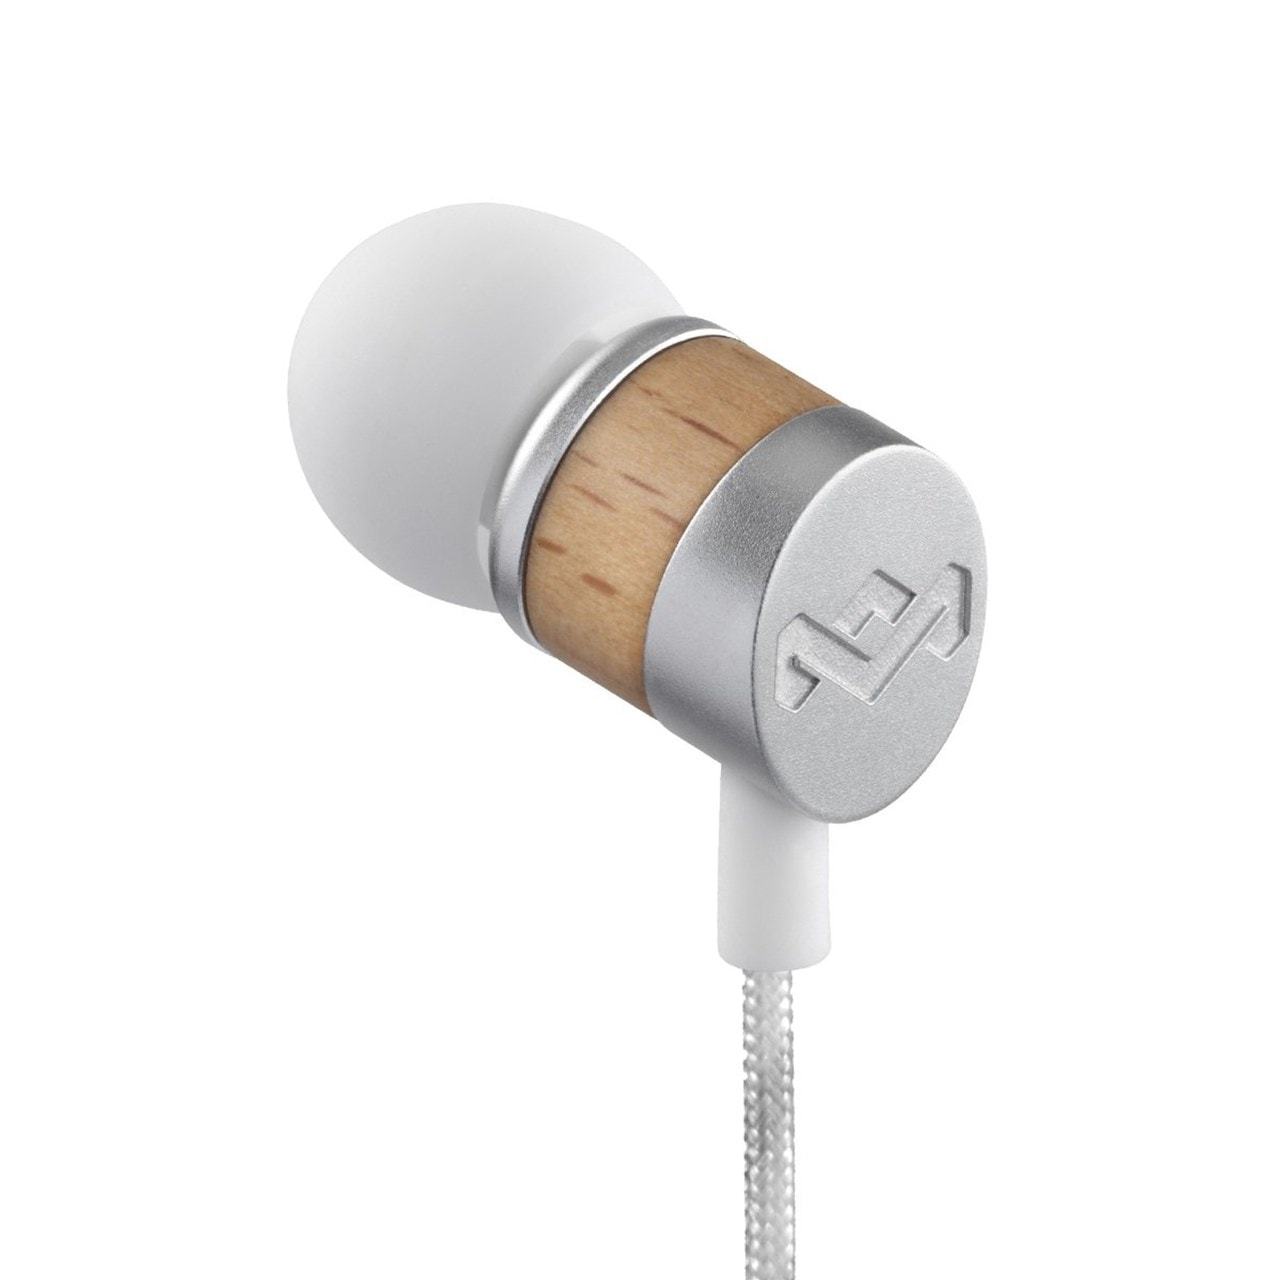 House Of Marley Uplift Drift Earphones W/Mic - 2